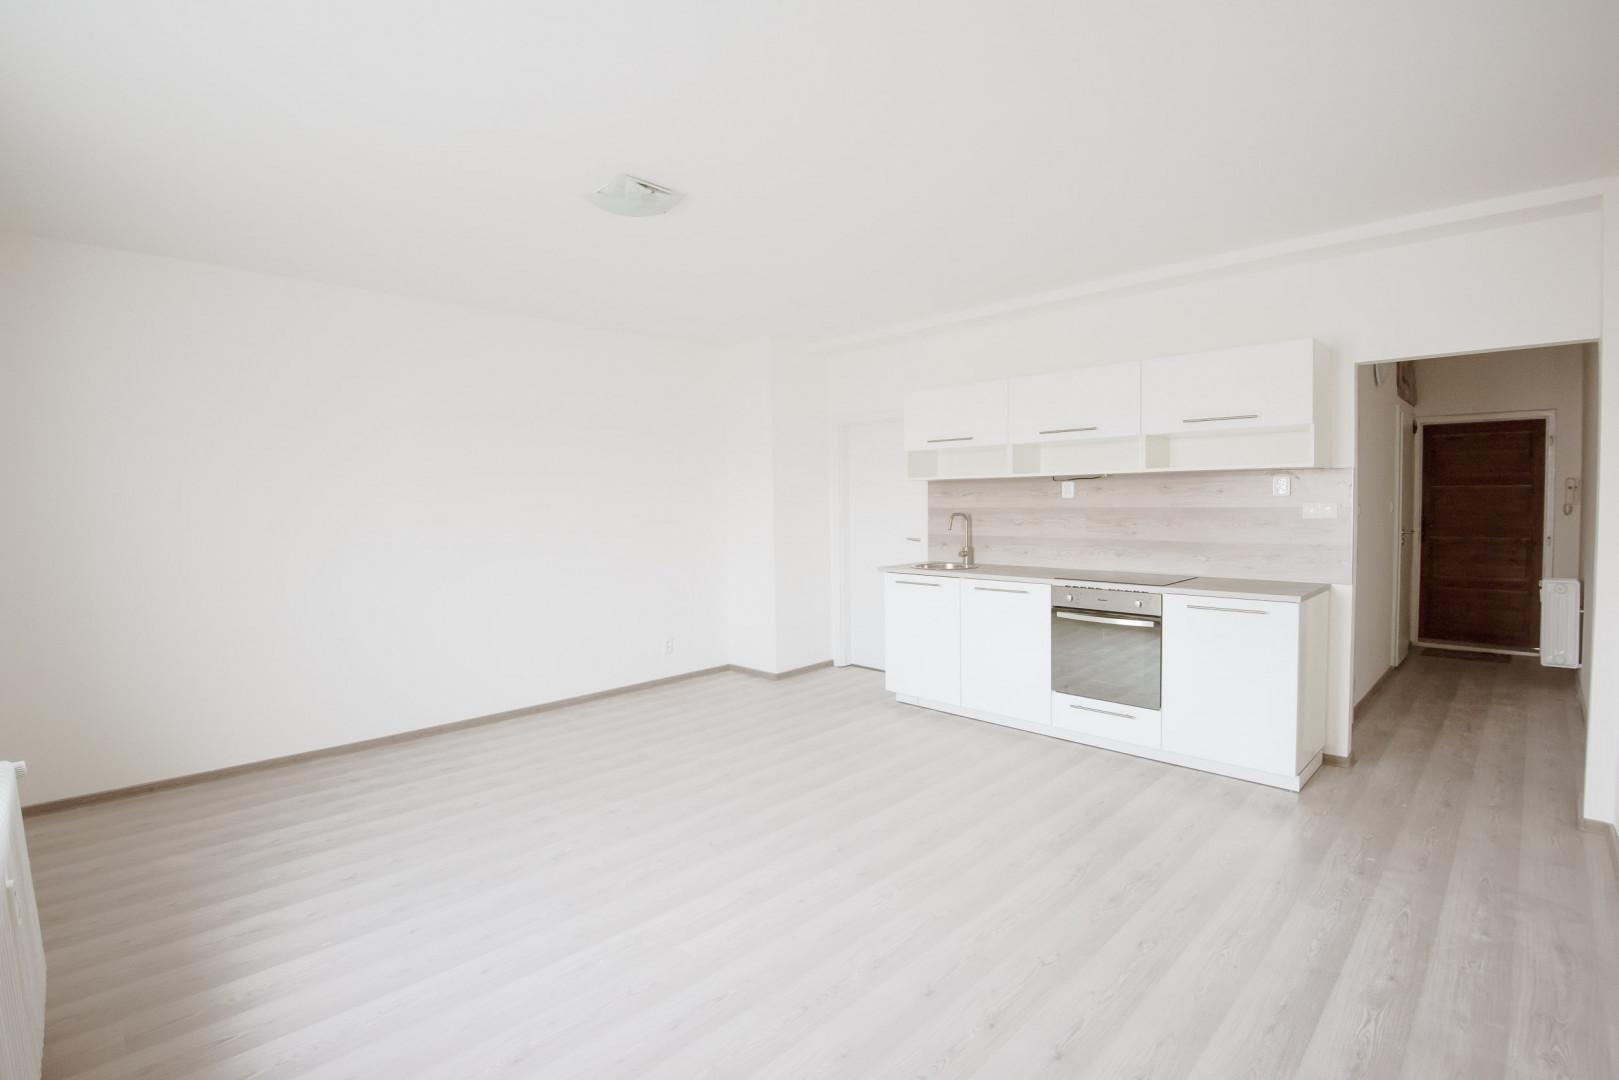 Byt, 2 - izbový, 44m2, Bratislava III - Nové mesto, Šancová ulica